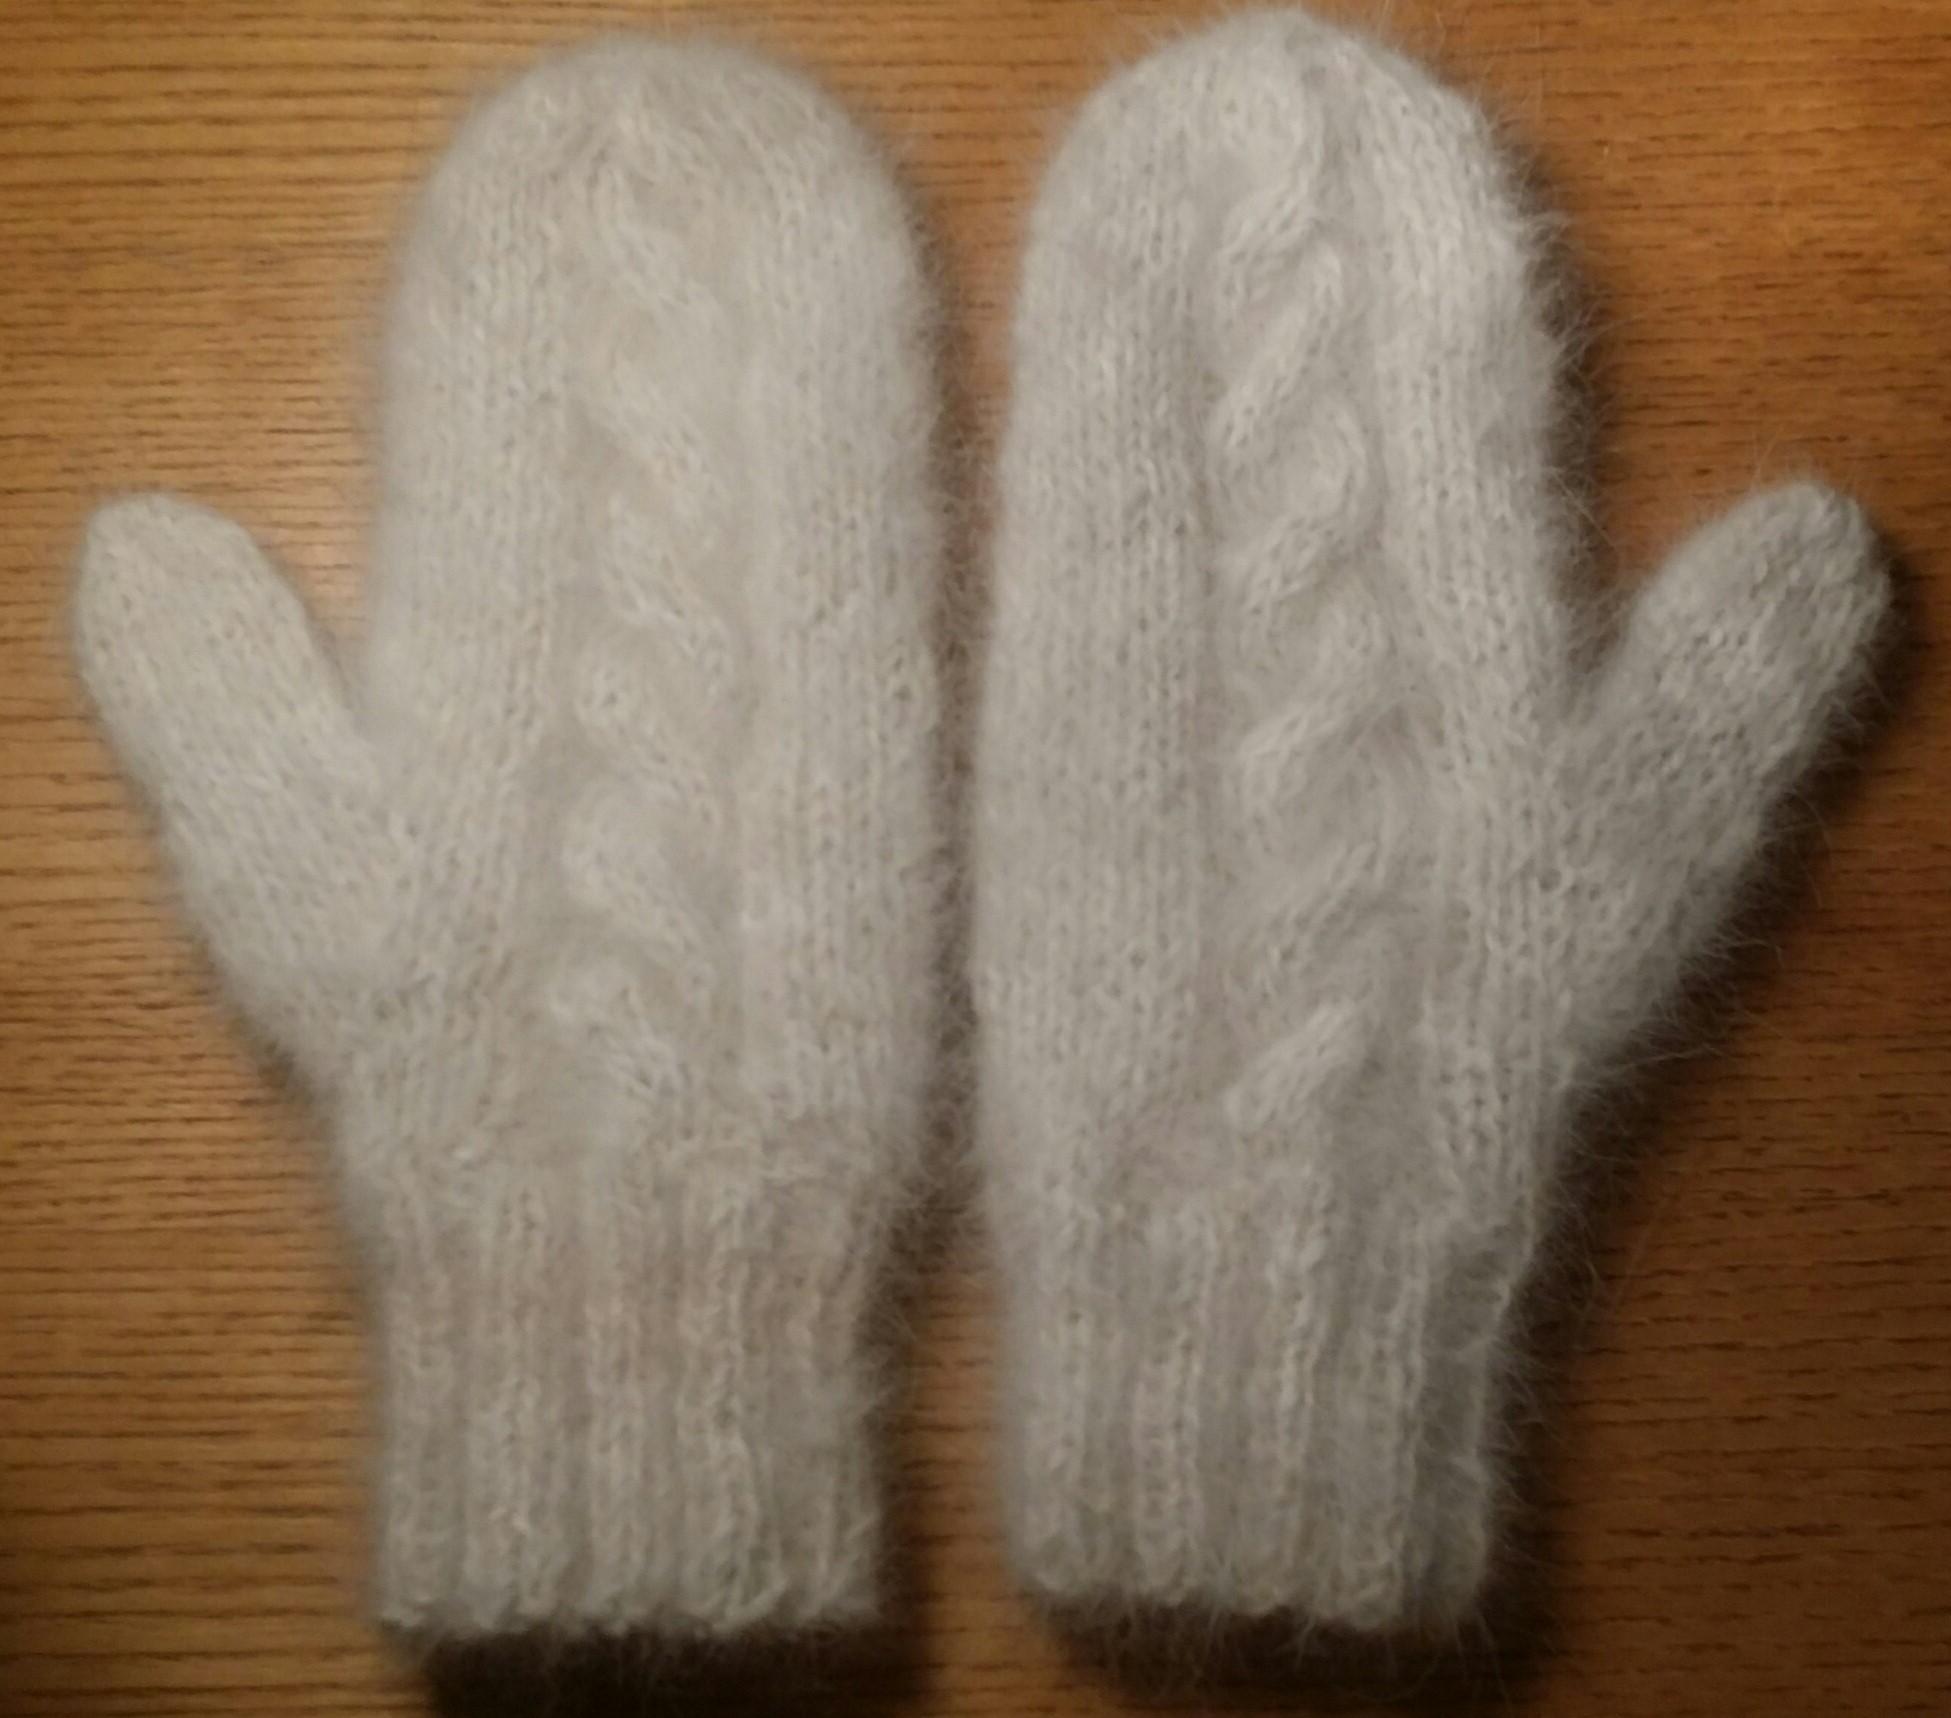 Kape, traki, rokavice - iz pasje ali mačje dlake